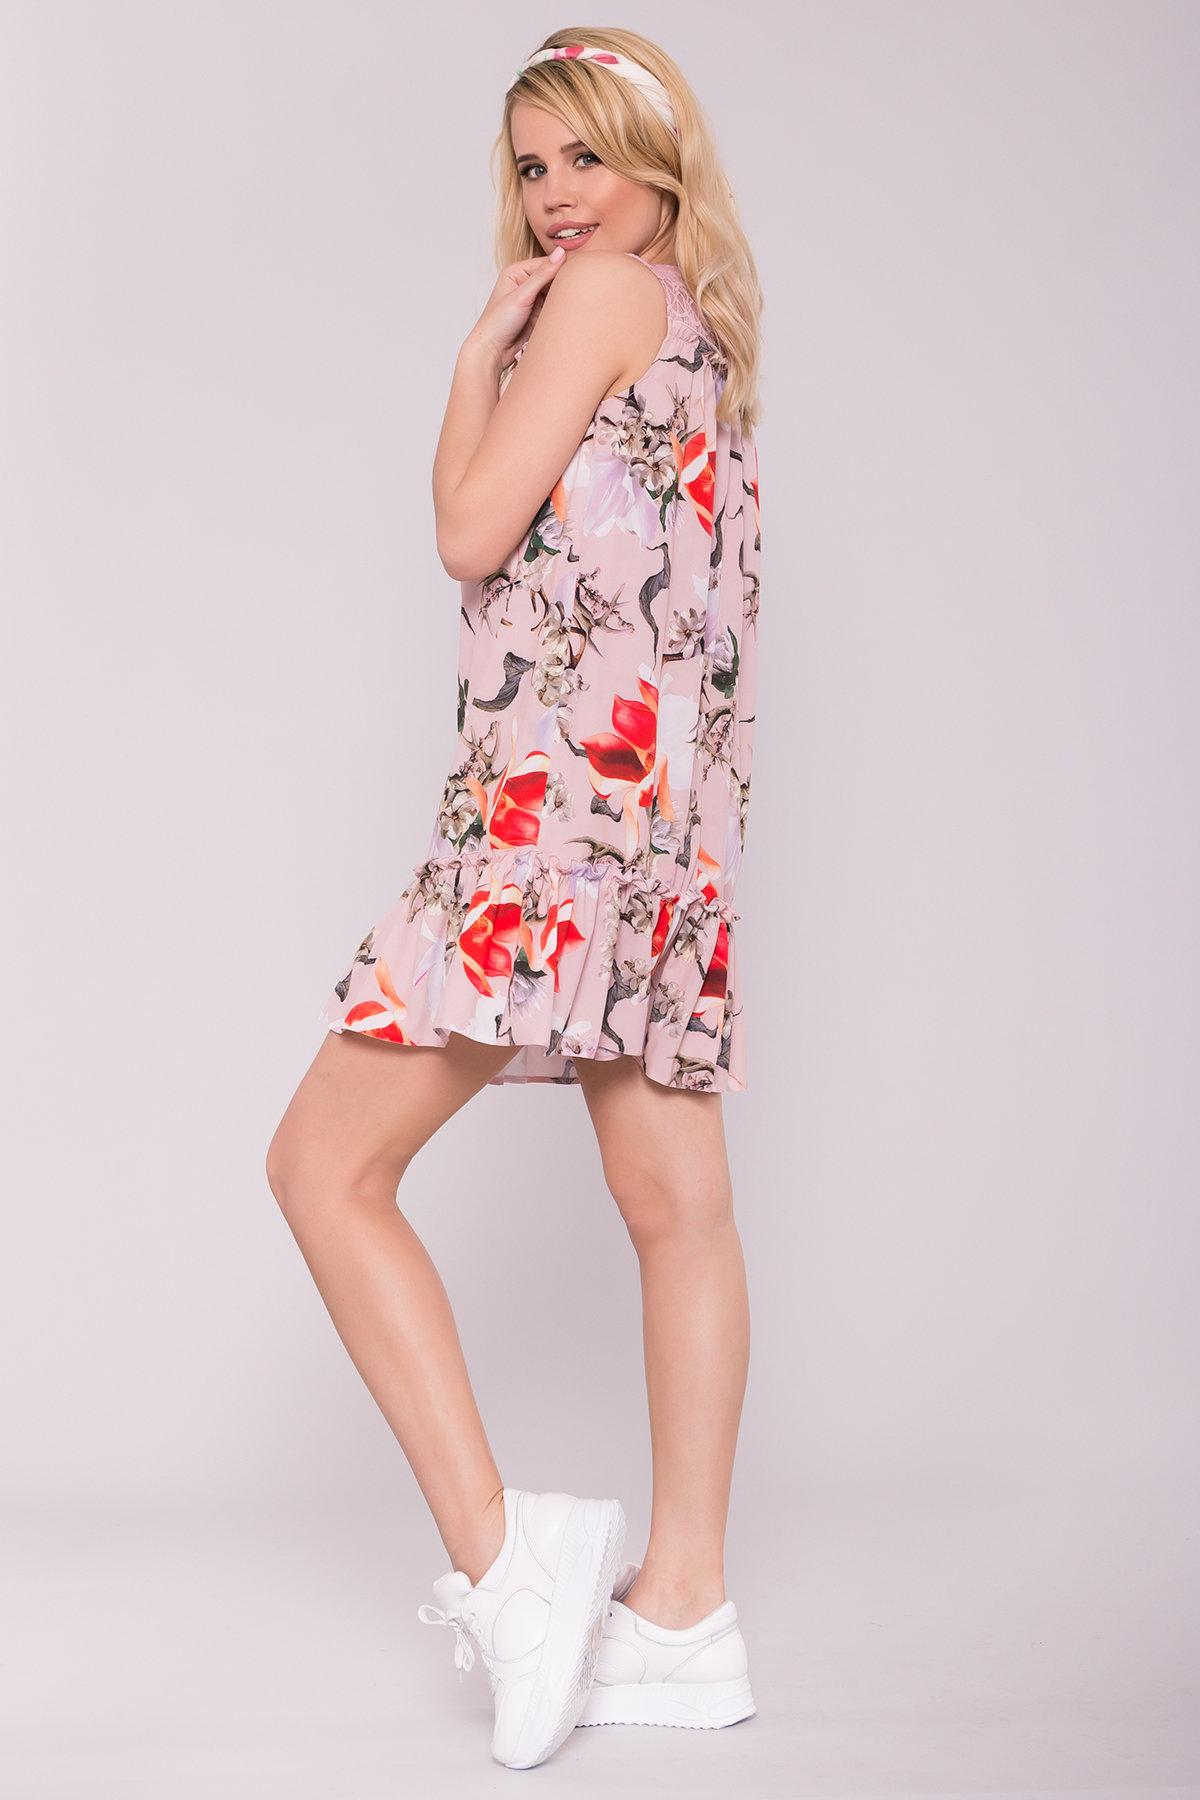 Платье Флеа 7112 АРТ. 42796 Цвет: цветы комби пудра/ коралл - фото 2, интернет магазин tm-modus.ru